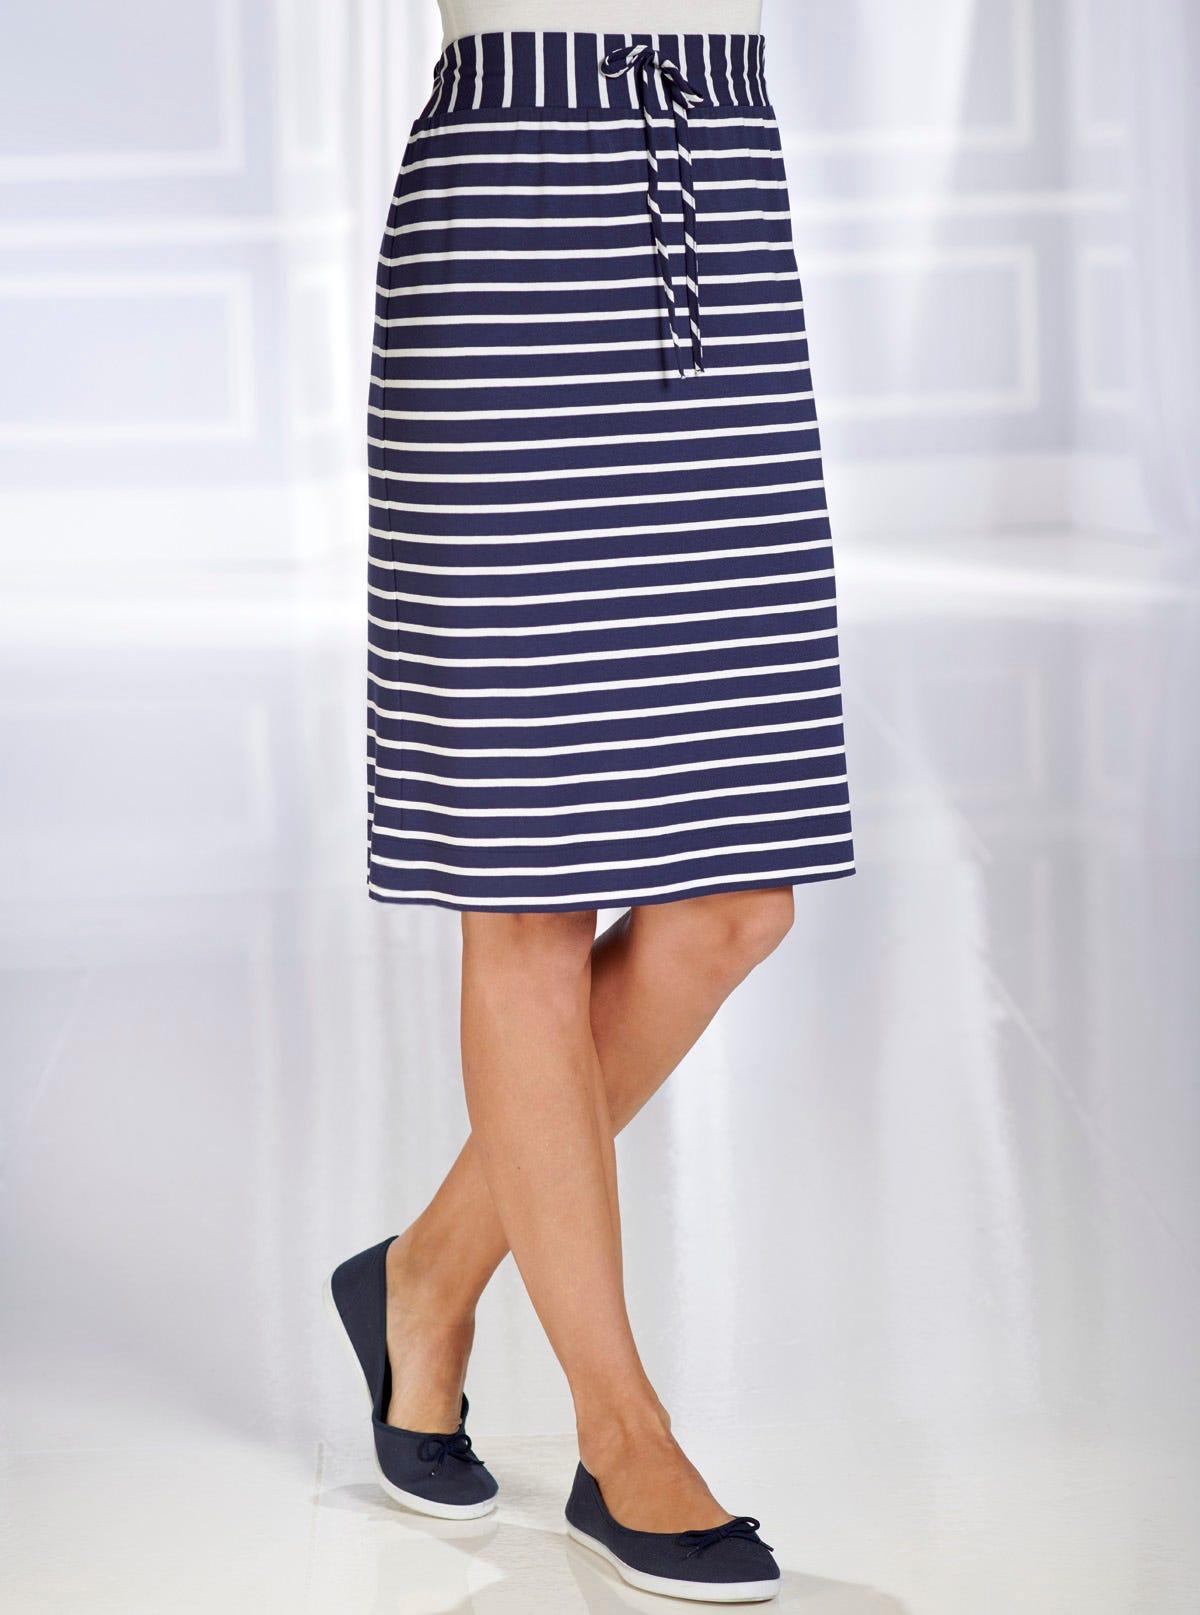 ef49a1c1a8 Comfy Jersey Skirt - Skirts - Travel